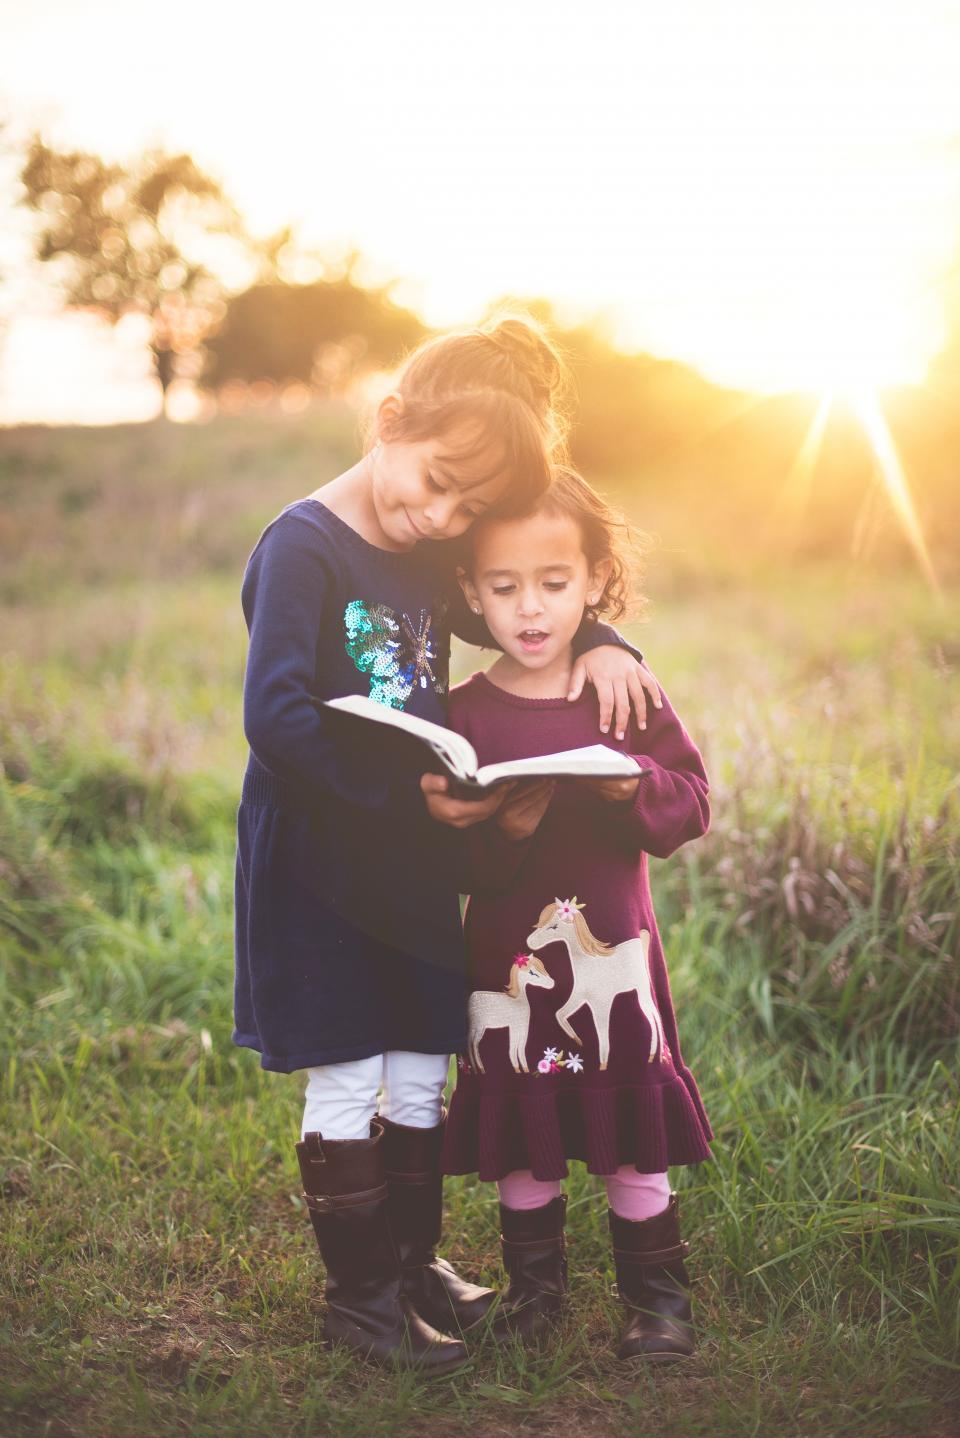 sunlight, sunshine, sunset, sunrise, sunny, grass, tree, nature, kids, girls, people, children, reading, book, bible, sky